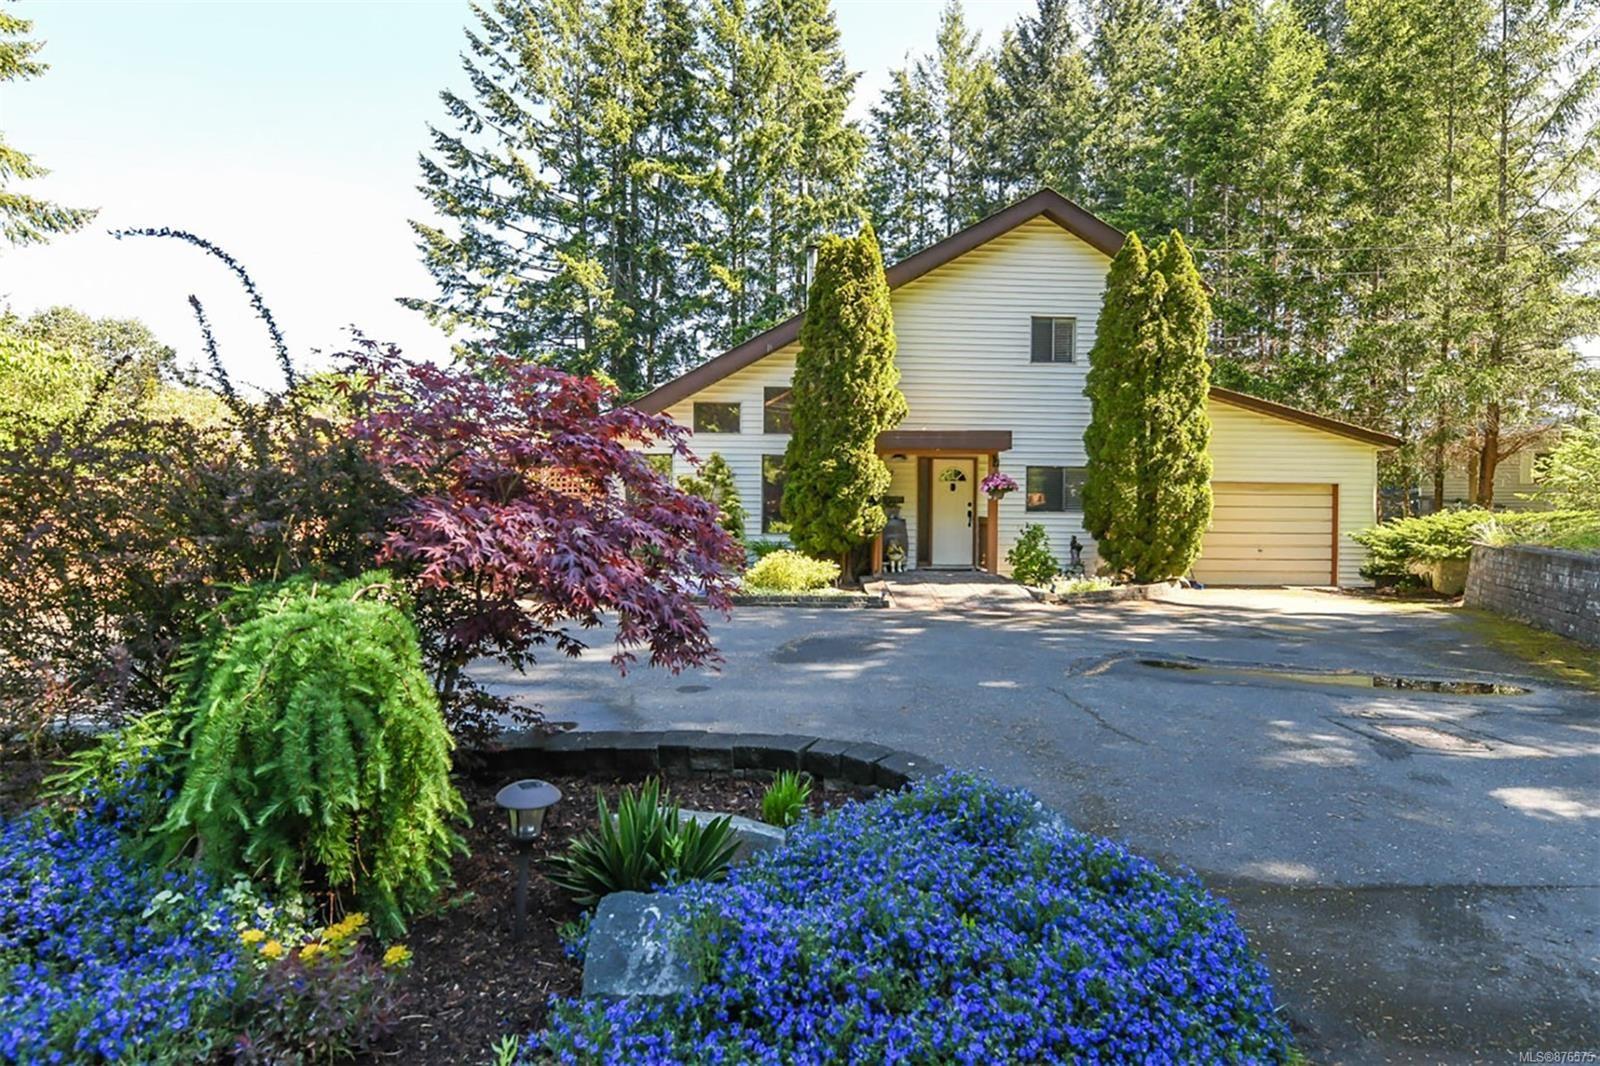 Main Photo: 1282 Wilkinson Rd in : CV Comox Peninsula House for sale (Comox Valley)  : MLS®# 876575